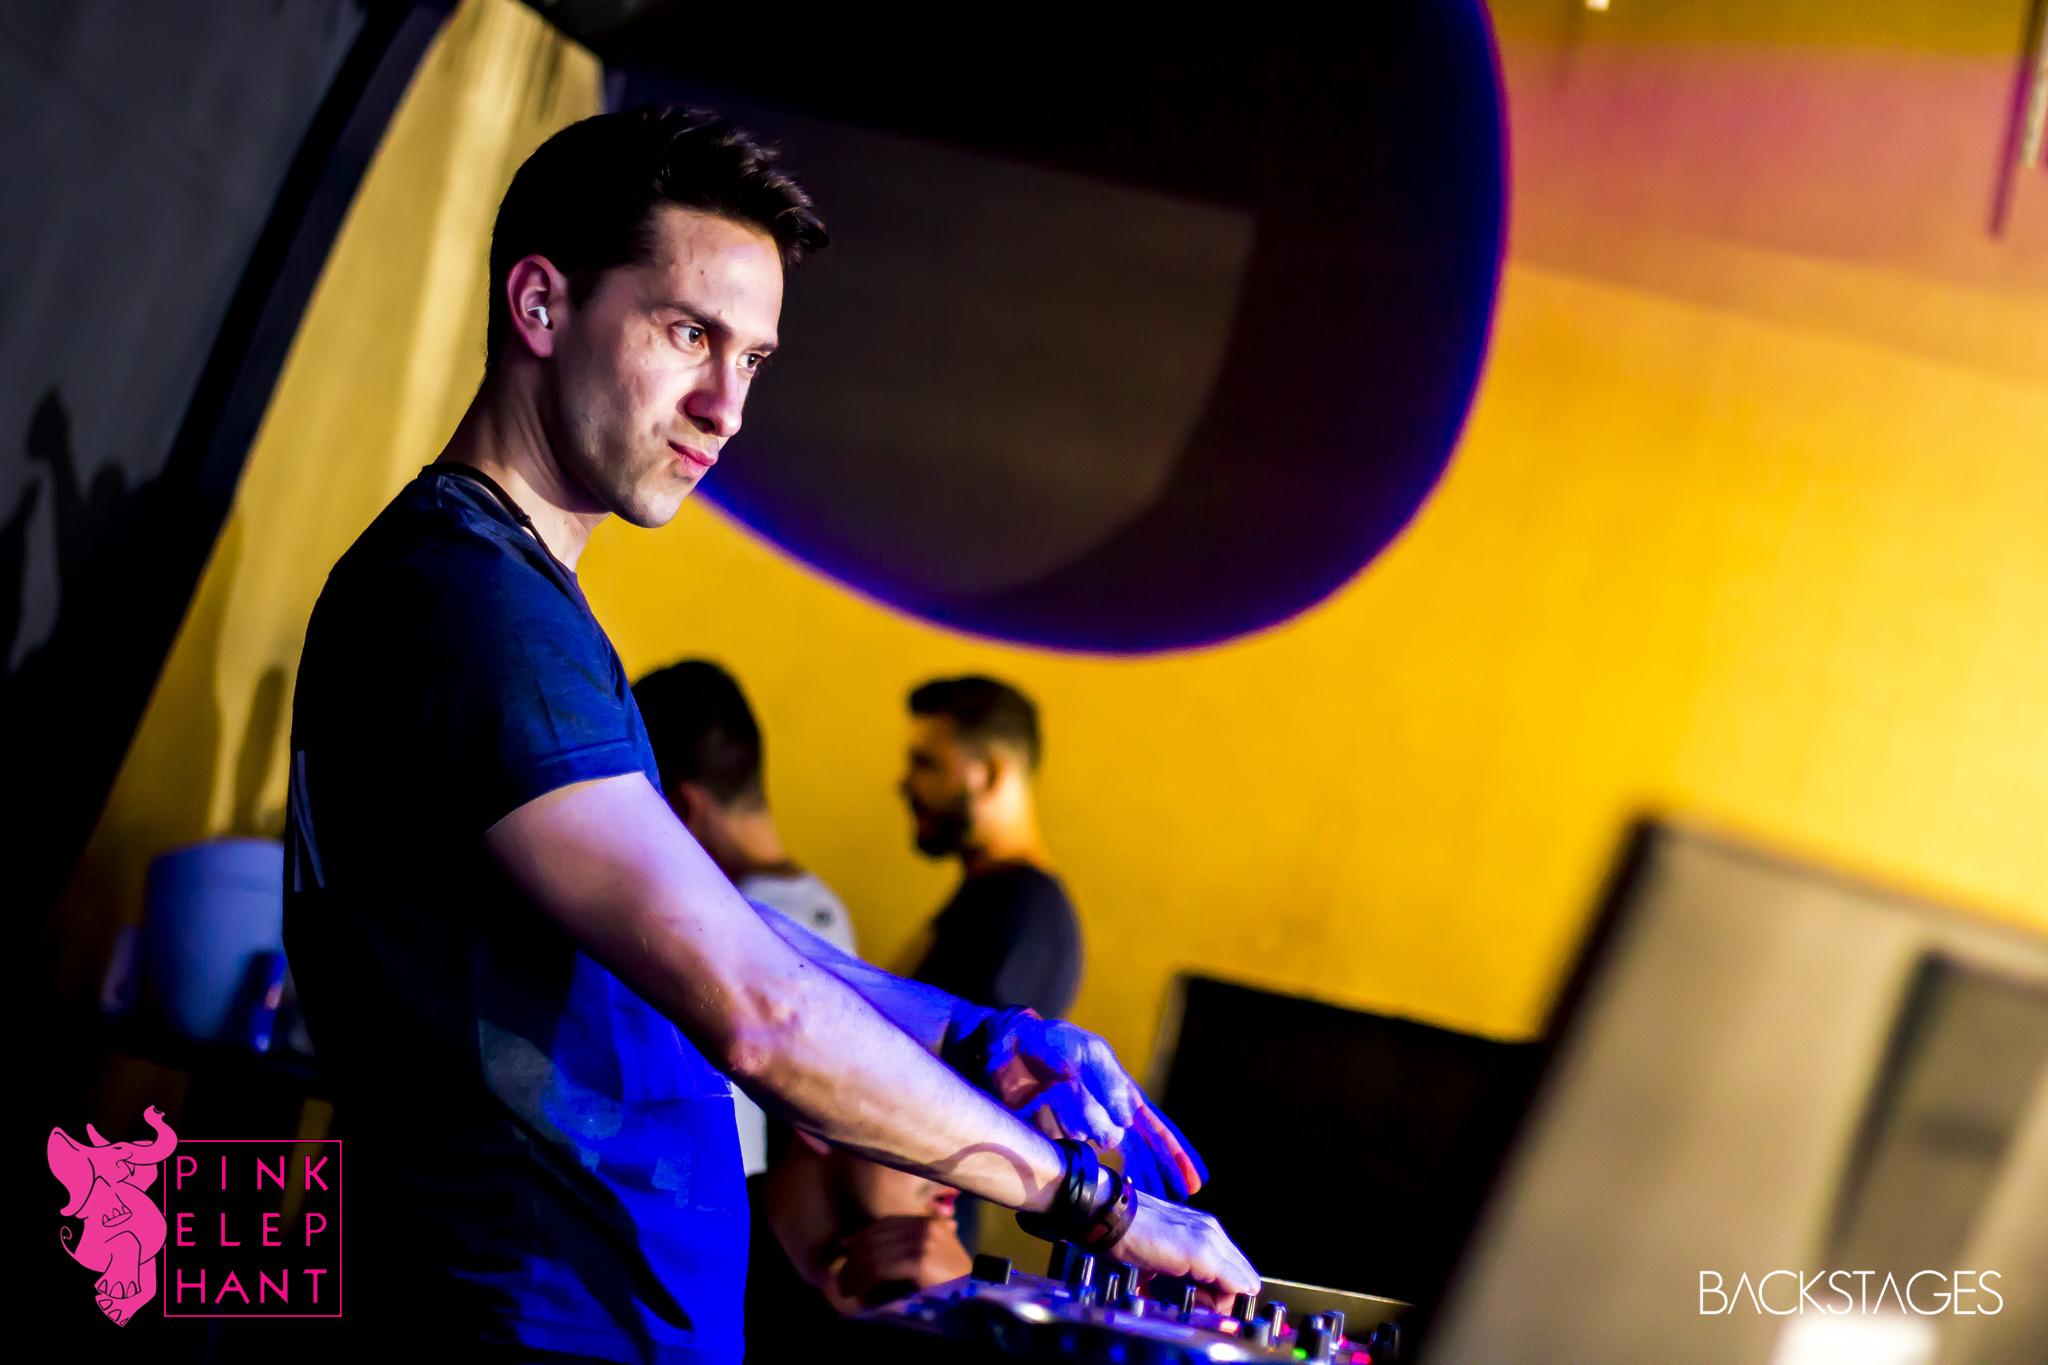 Pink-elephant-club-sorocaba-revista-backstages-foto-kenzi-marinho (33)